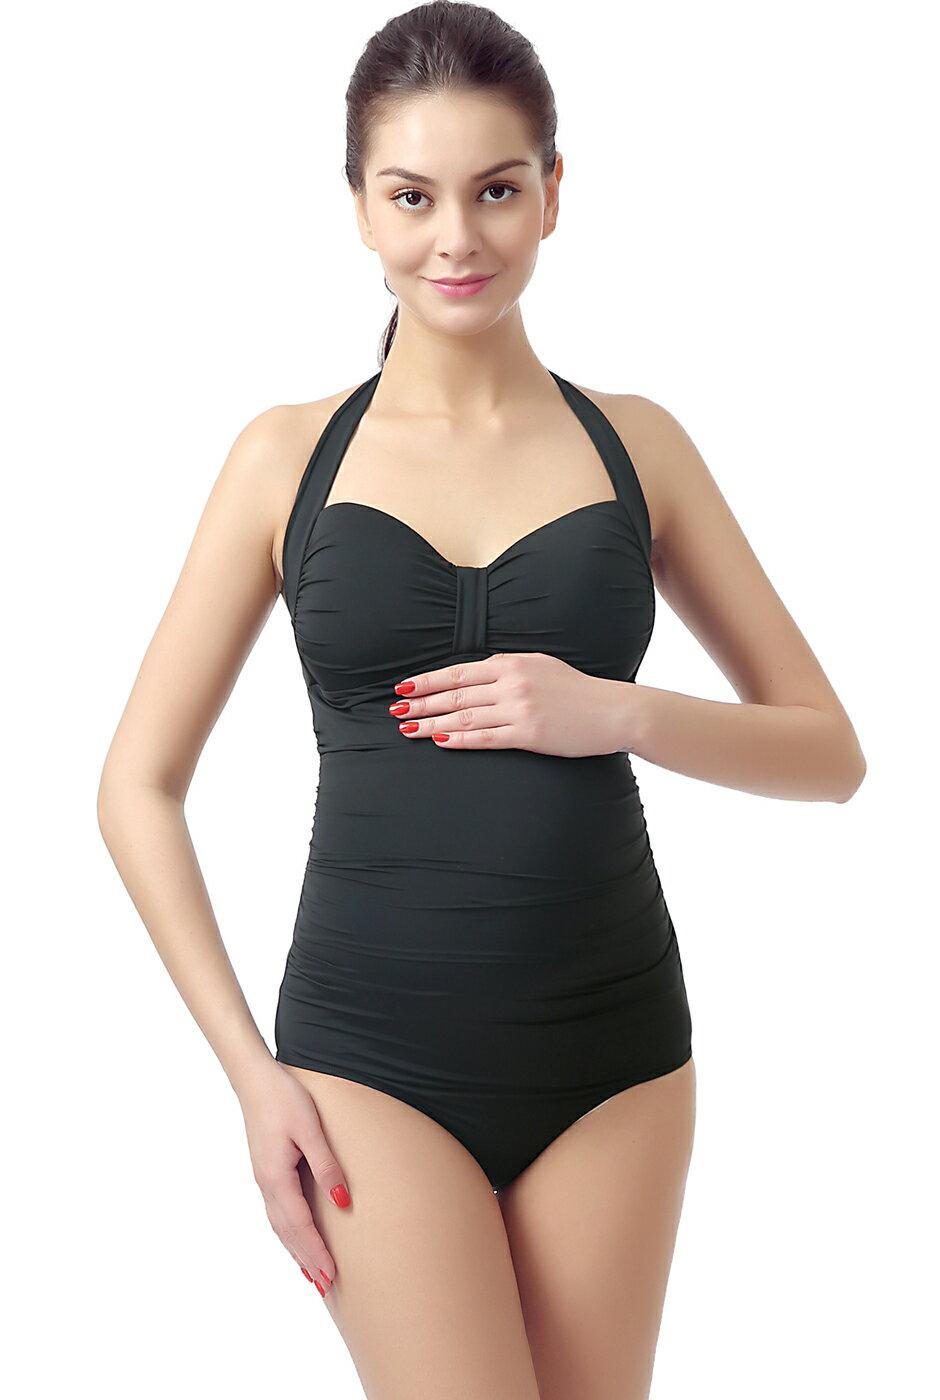 2a3d1676f6f55 Luxury Lane: Momo Maternity UPF 50+ One Piece Halter Swimsuit ...